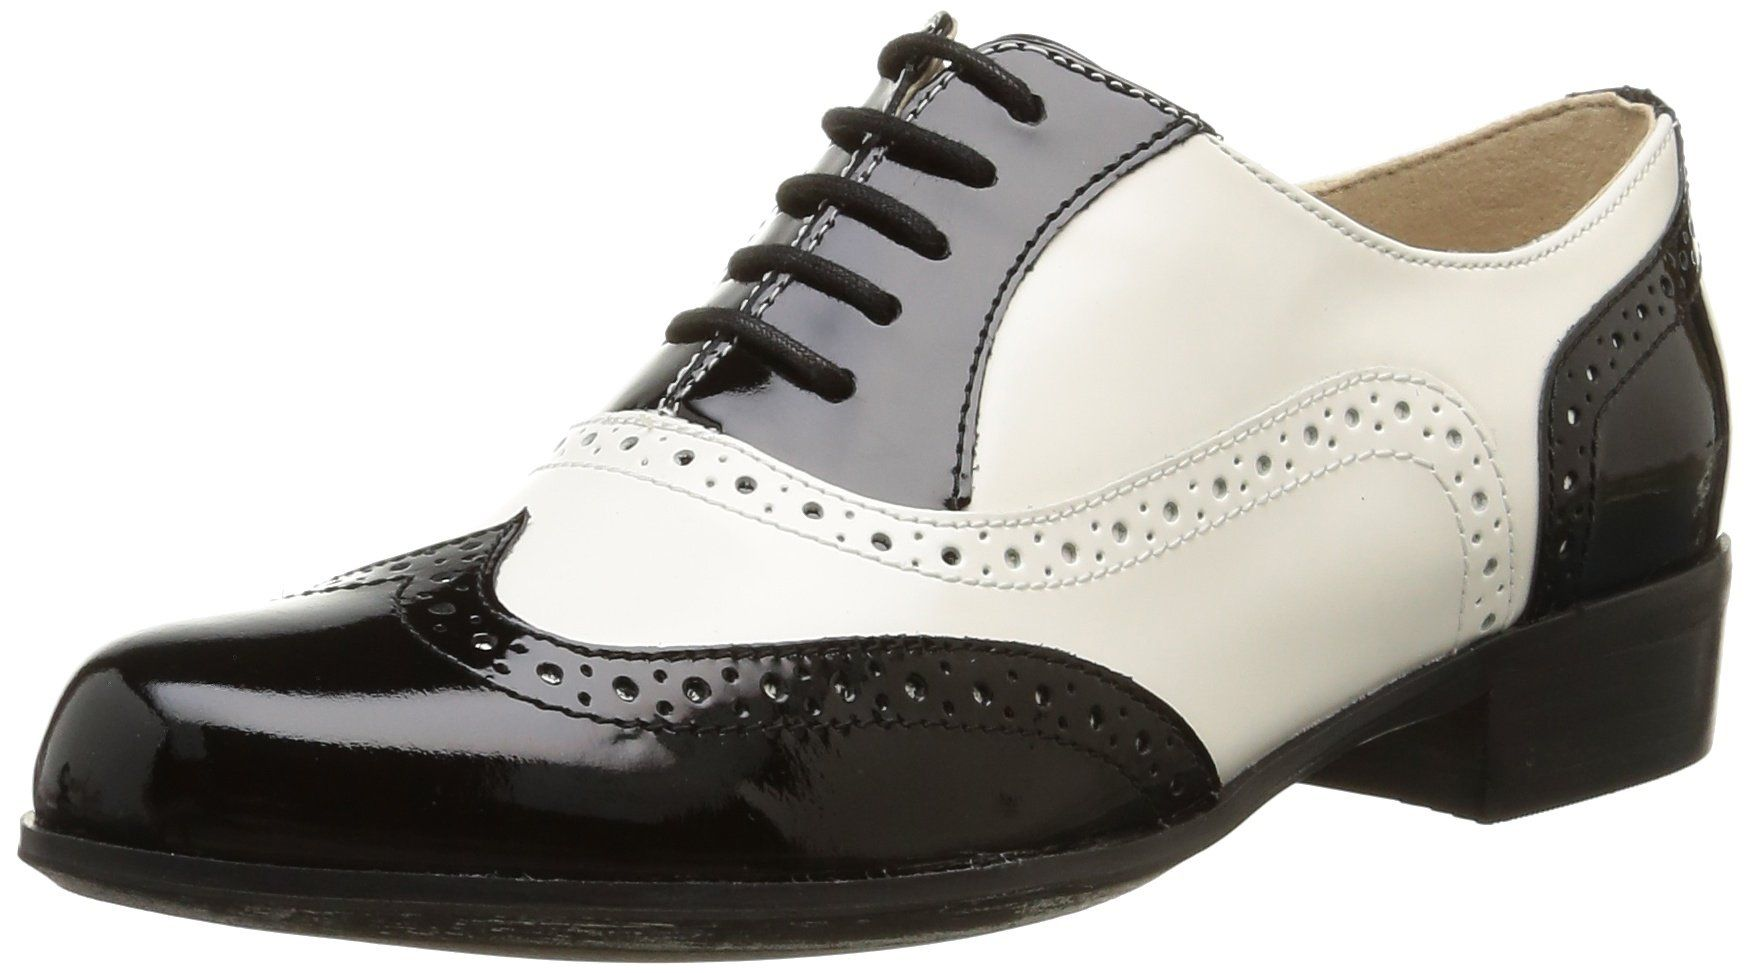 b6bf507bf0834 53 Clarks Women's Hamble Oak Brogue Lace-Up Half Shoe: Amazon.co.uk ...